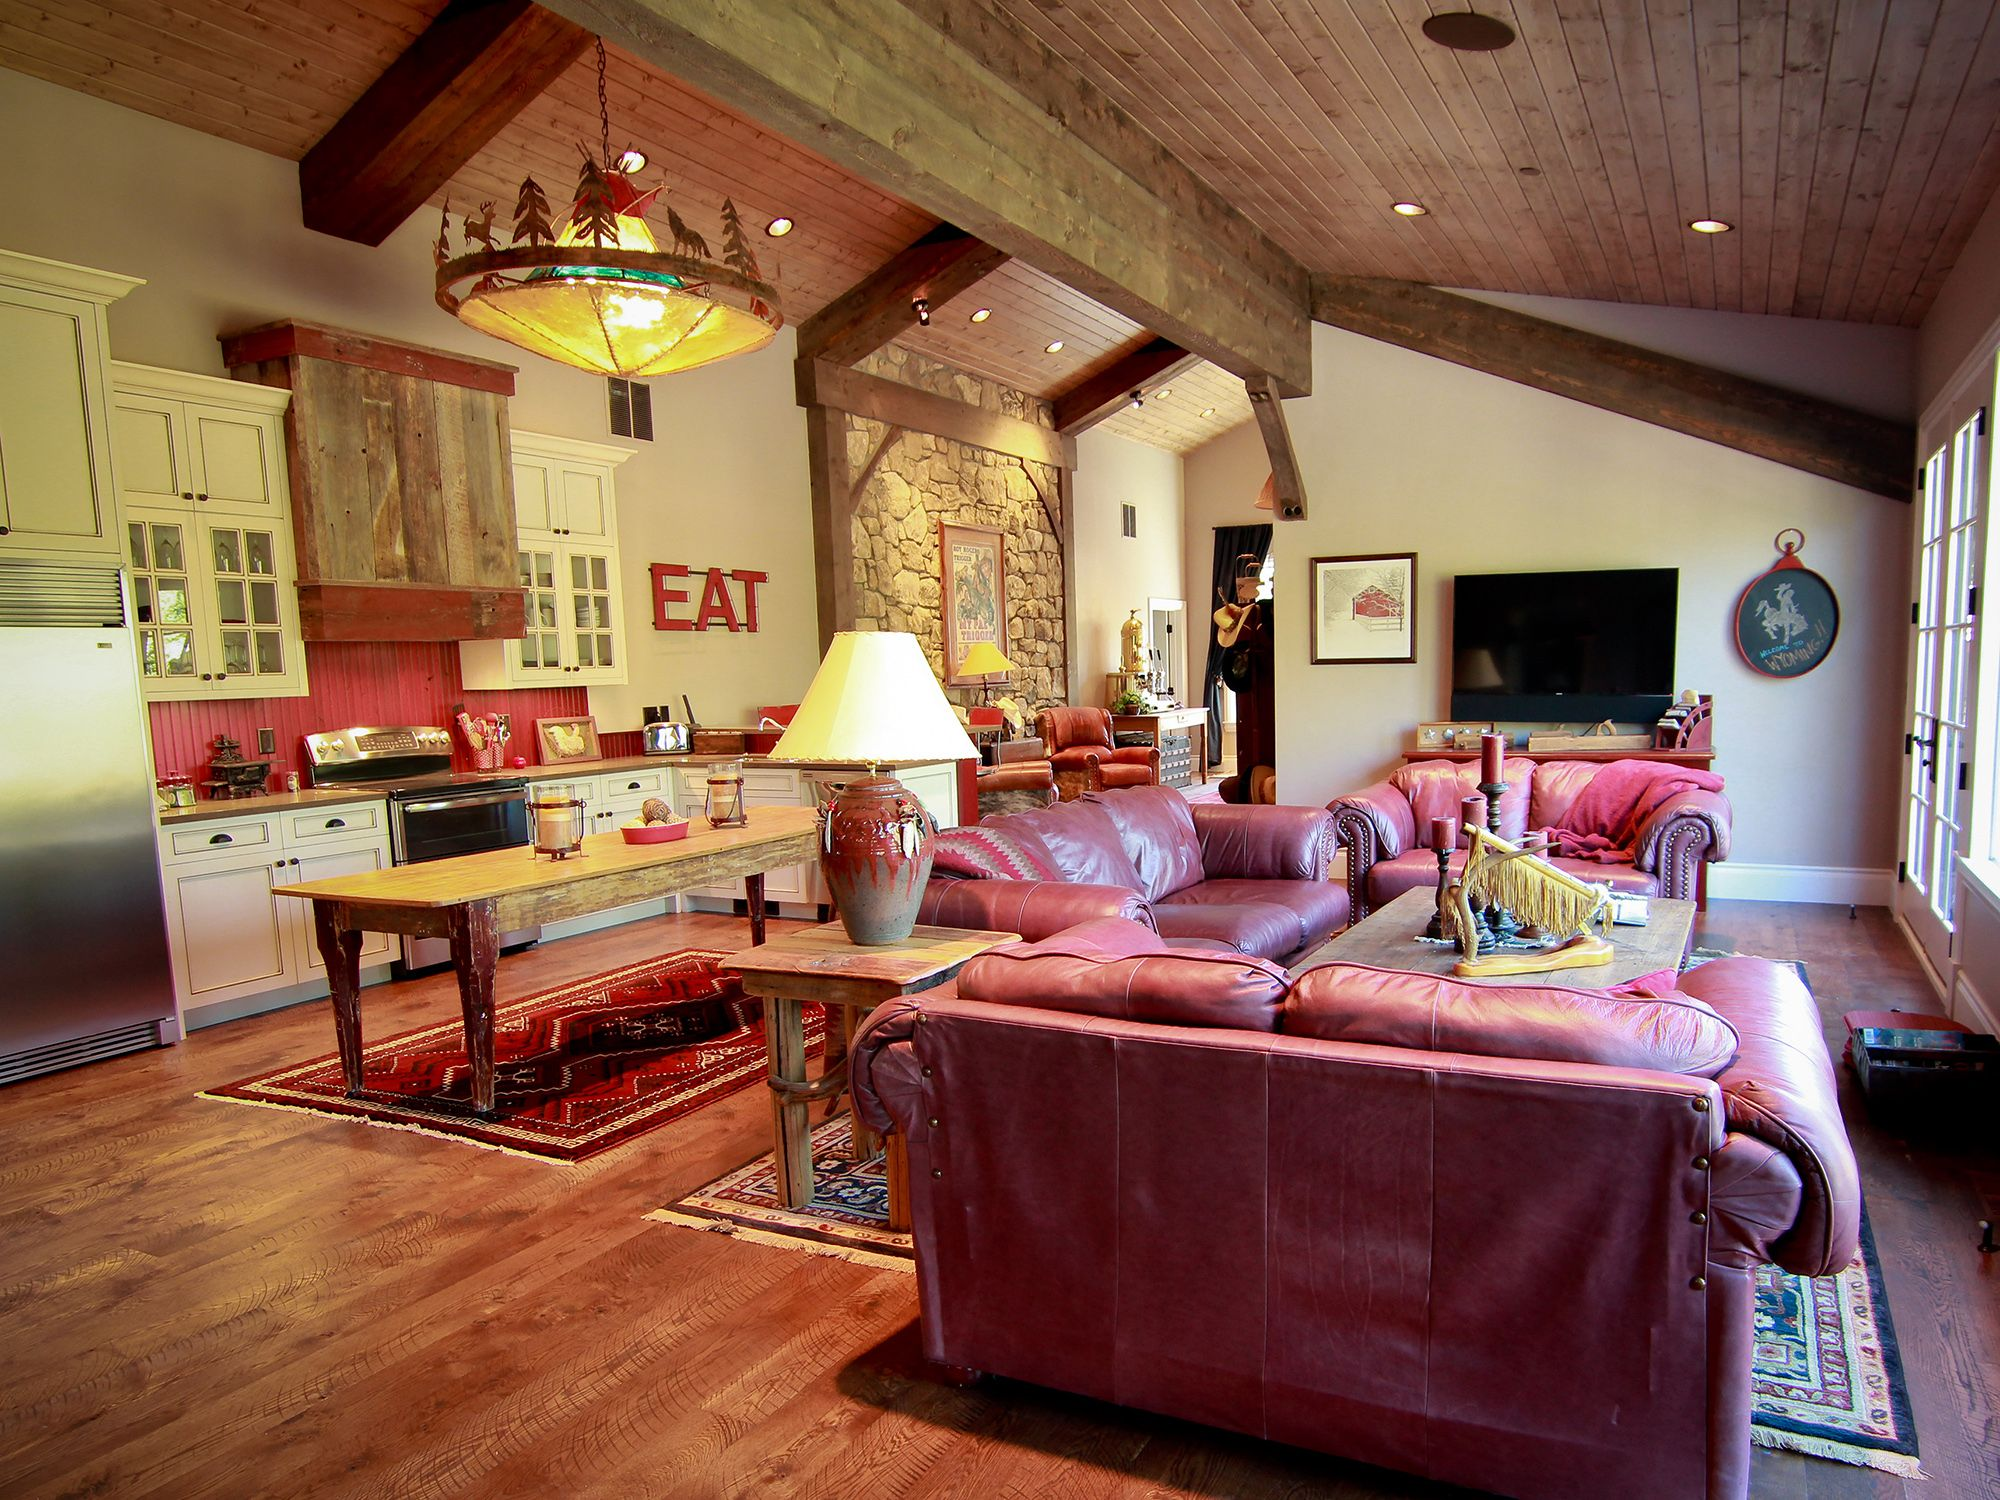 Apartment Barn Barn With Loft The Denali Barn Apt 36 Barn Pros Barn With Living Quarters Barn Loft Apartment Barn Living